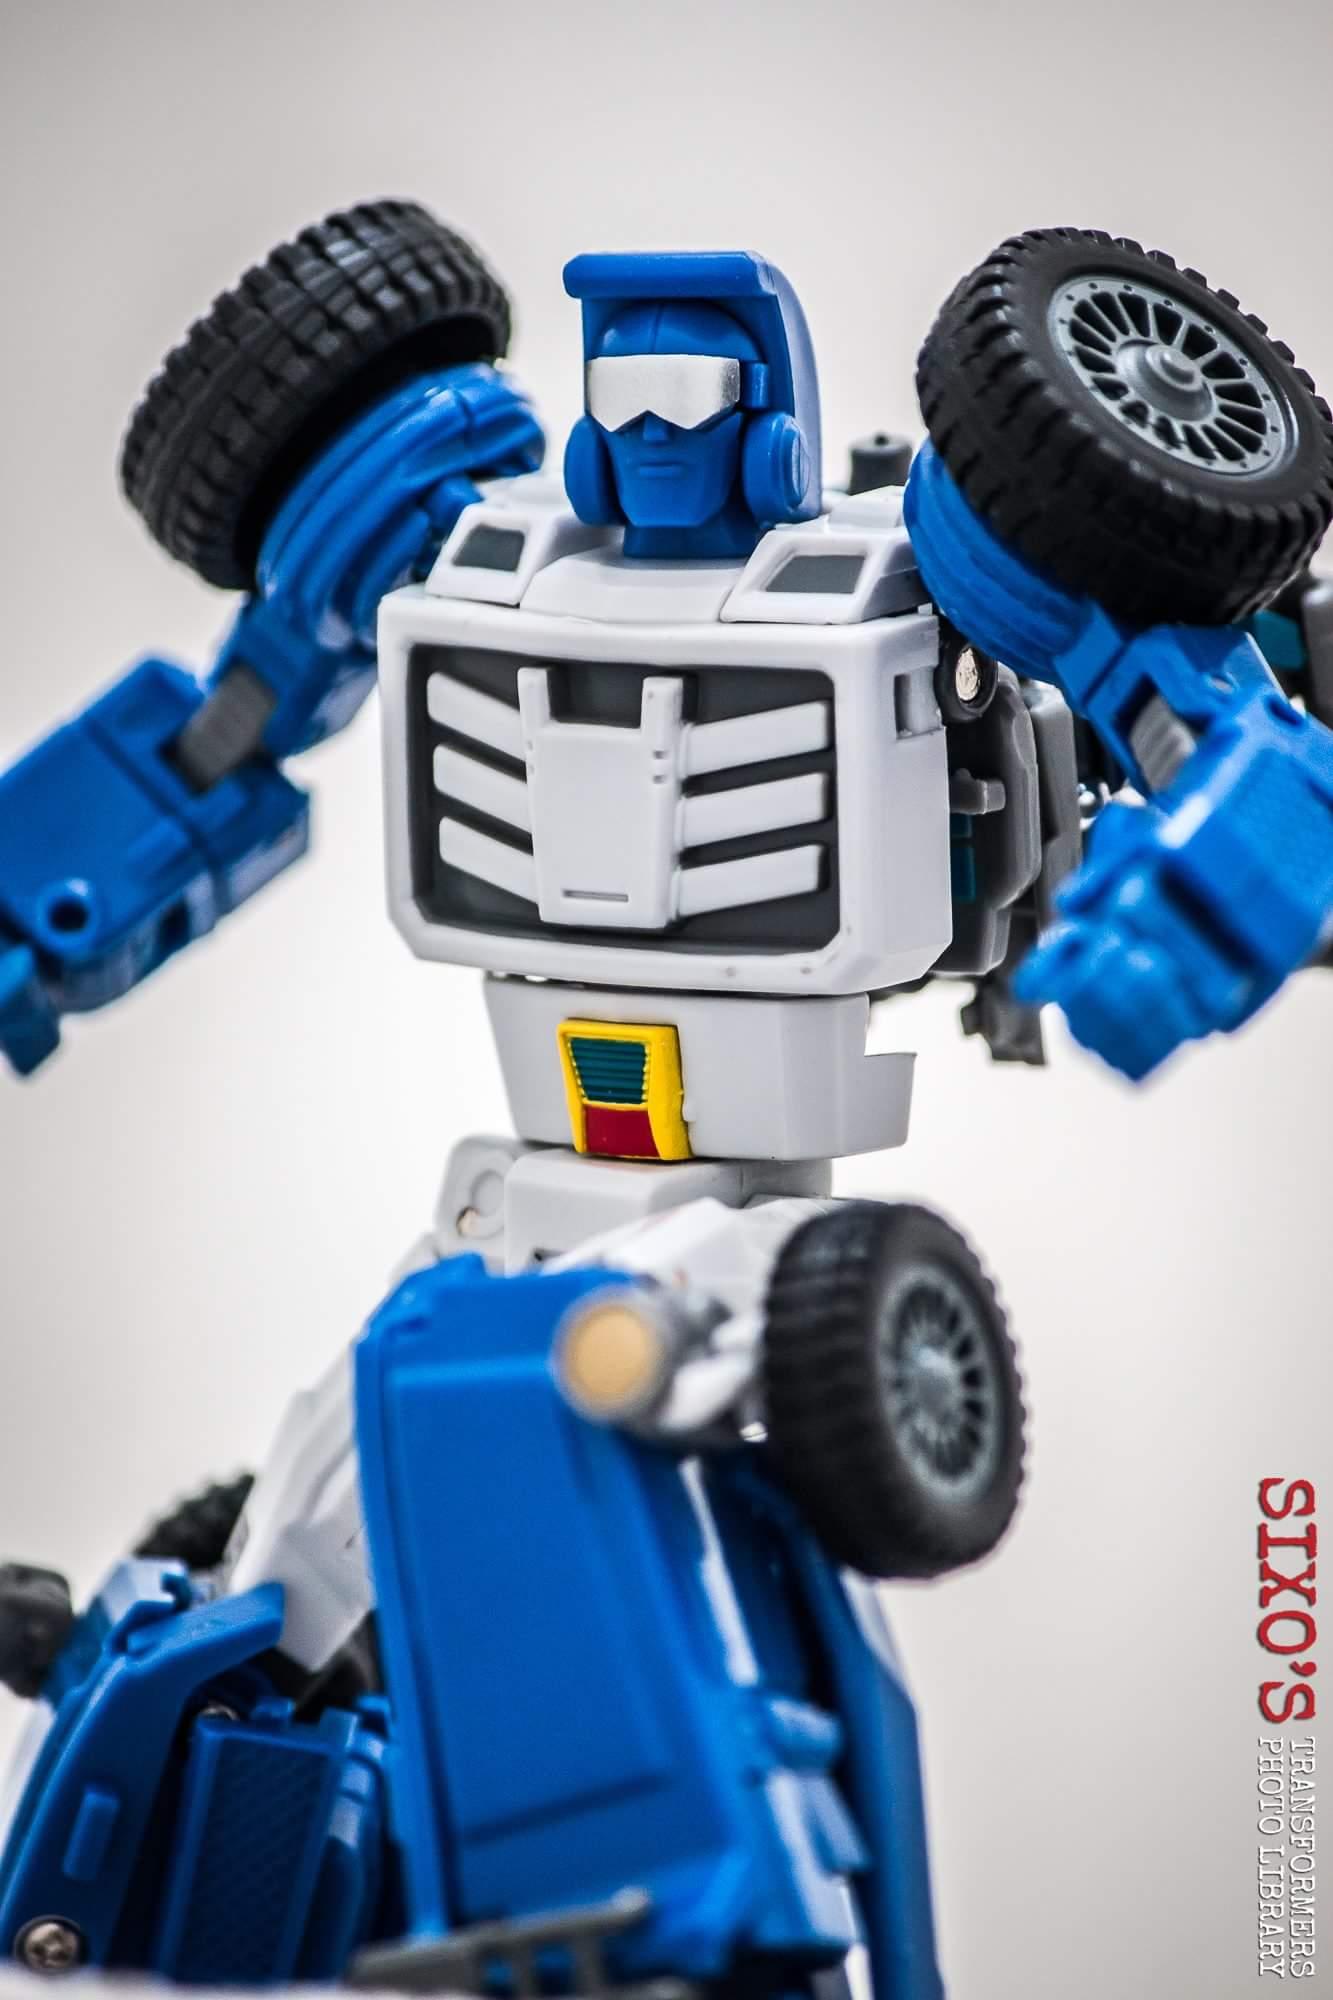 [X-Transbots] Produit Tiers - Minibots MP - Gamme MM - Page 6 TDhZSQLW